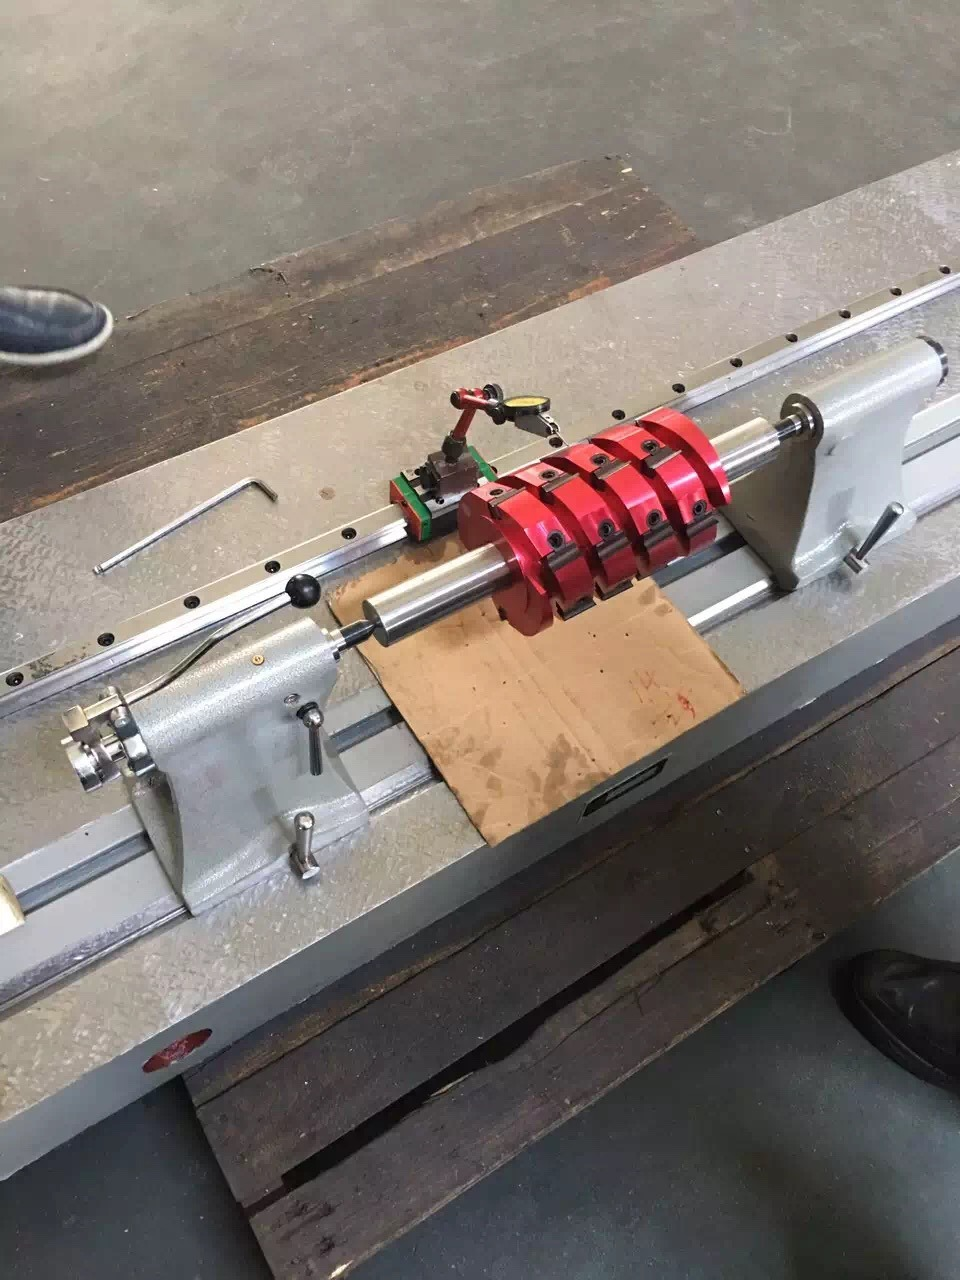 Wood Planer Machine Blade Jet Planer Helical Head Ridgid Planer Knives and Blades for Sale